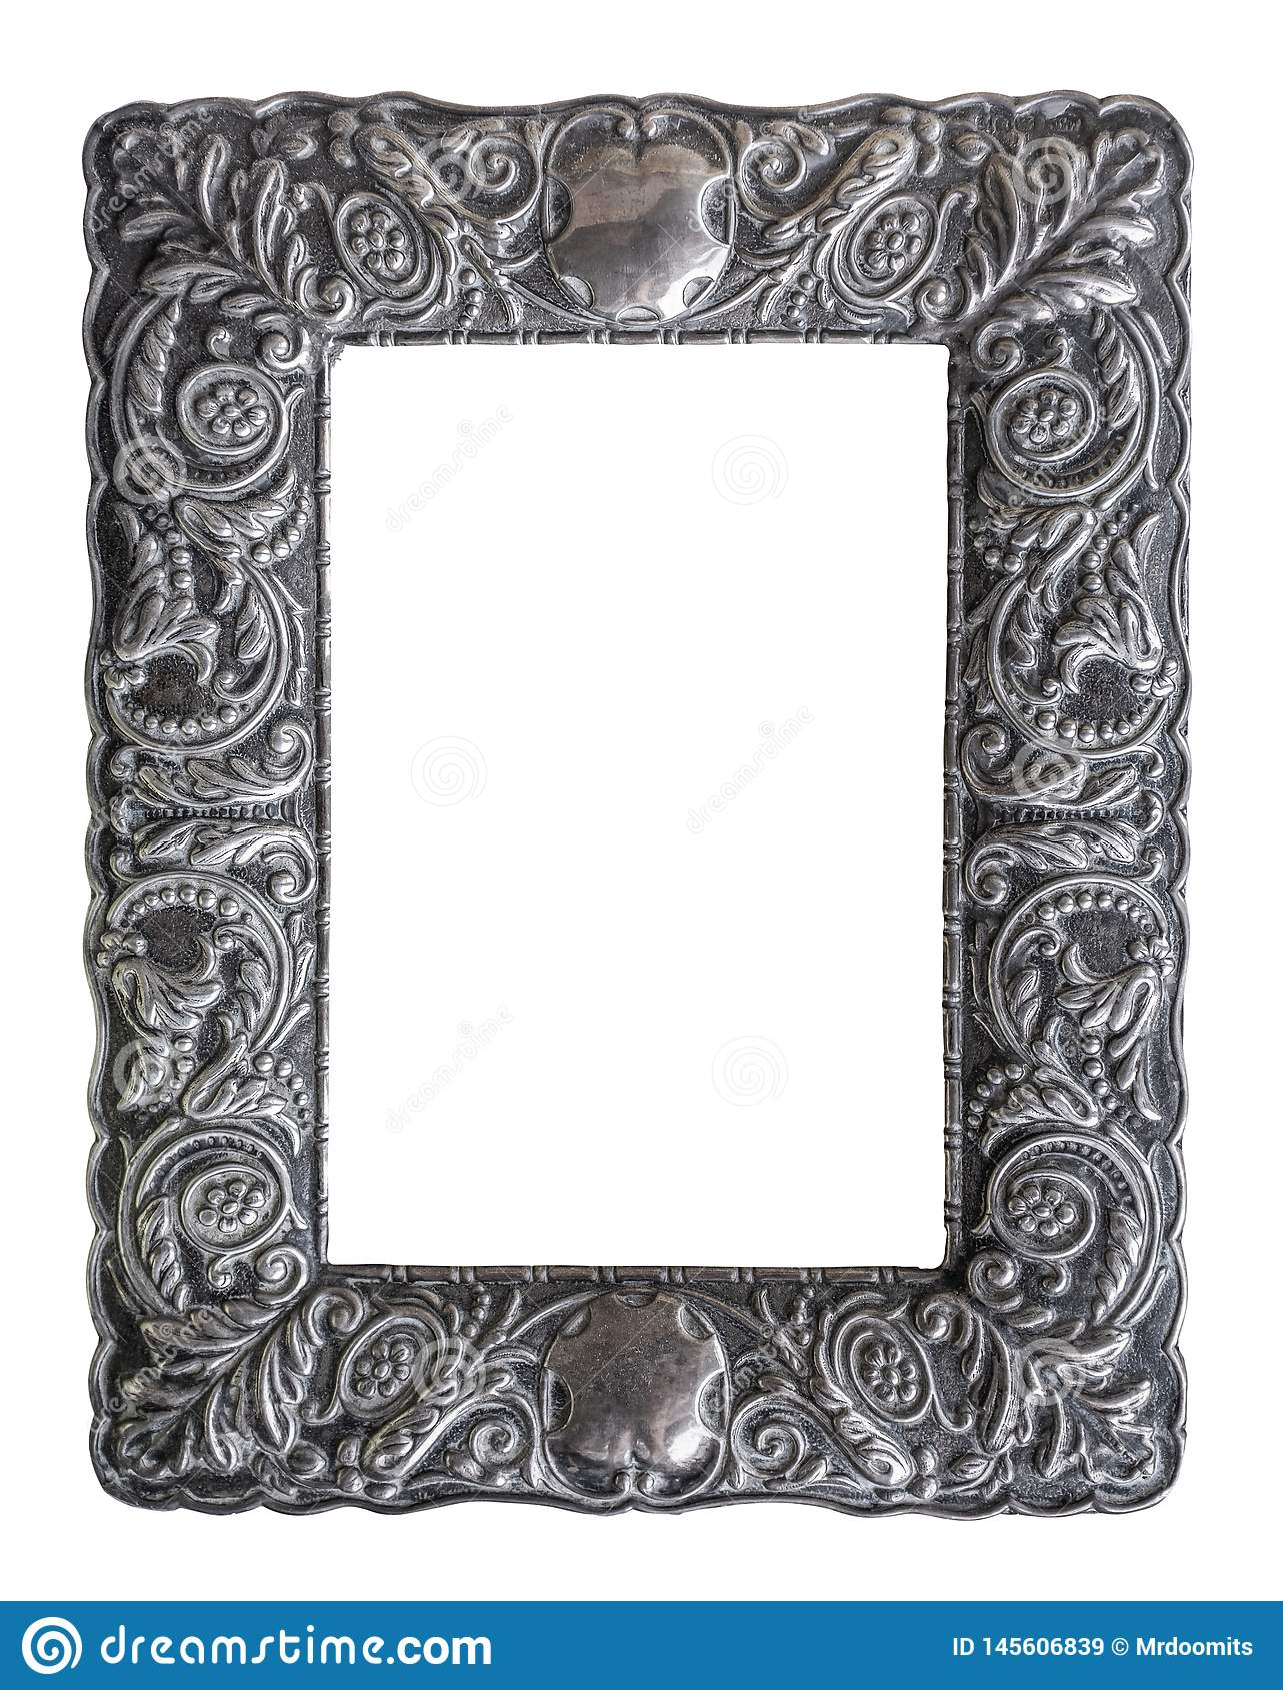 Moldura para retrato de prata ornamentado isolada